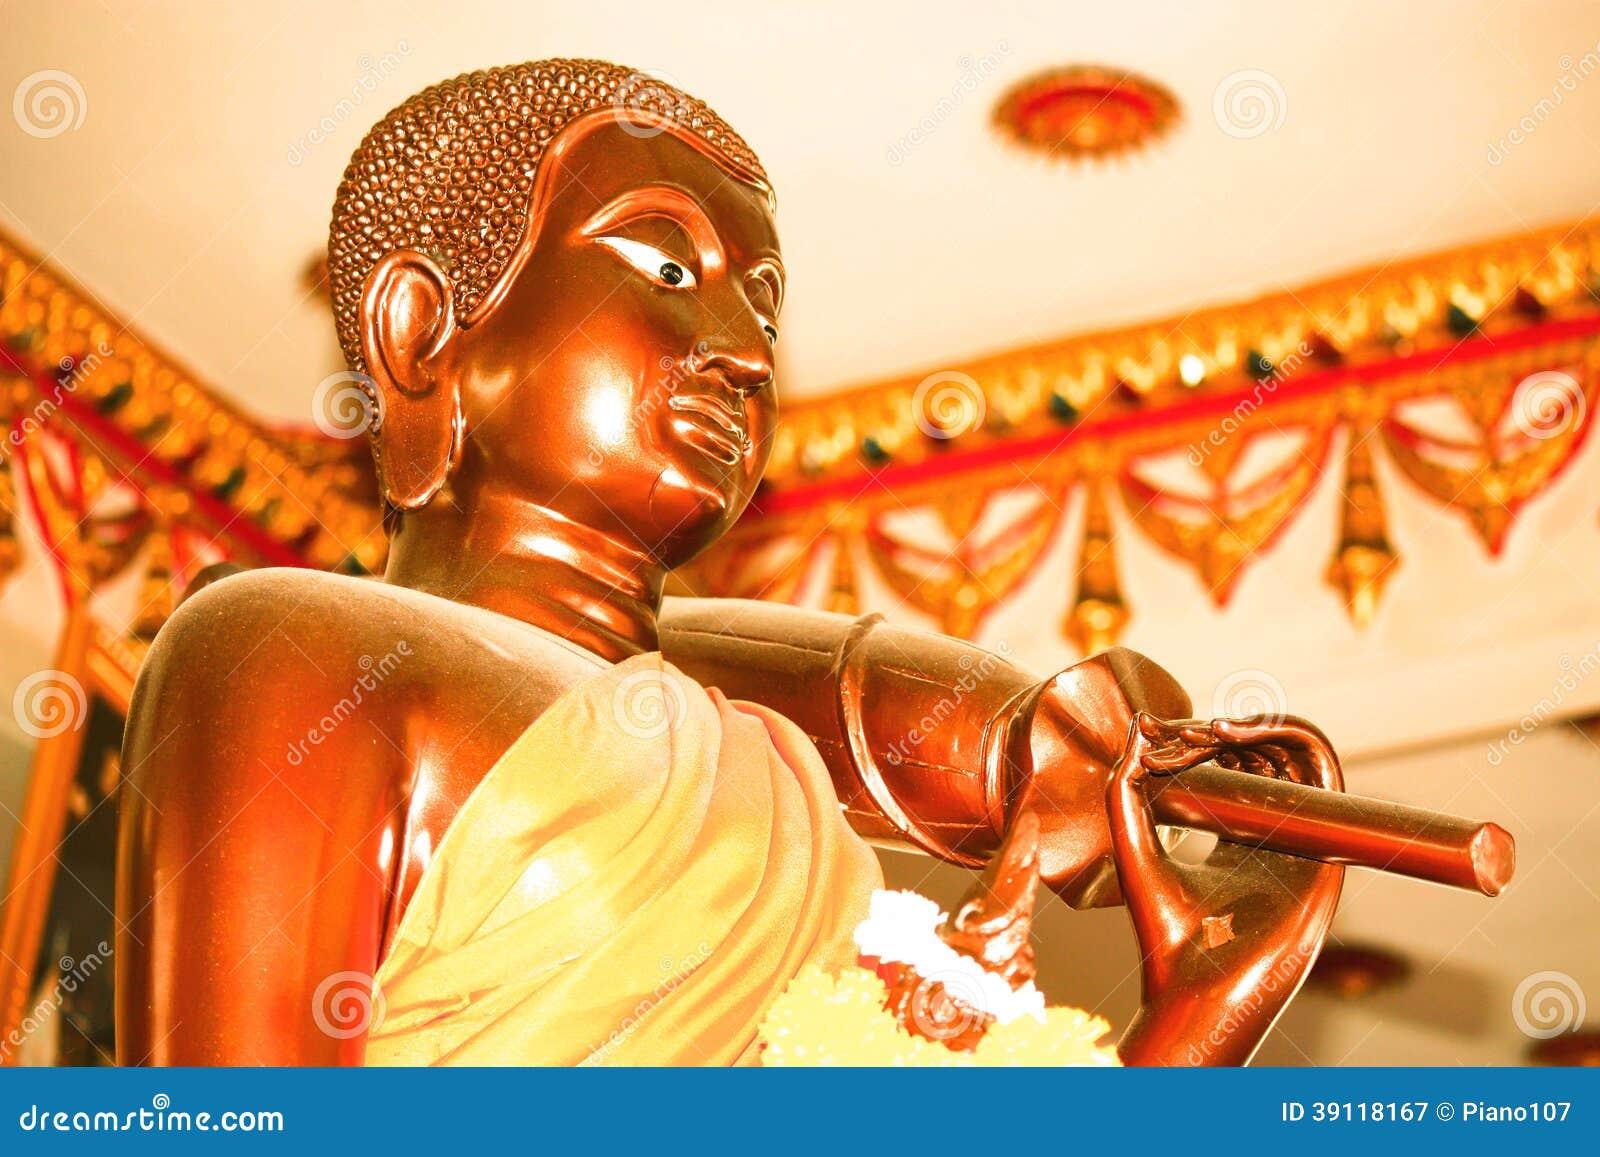 Standbeeld van monnik